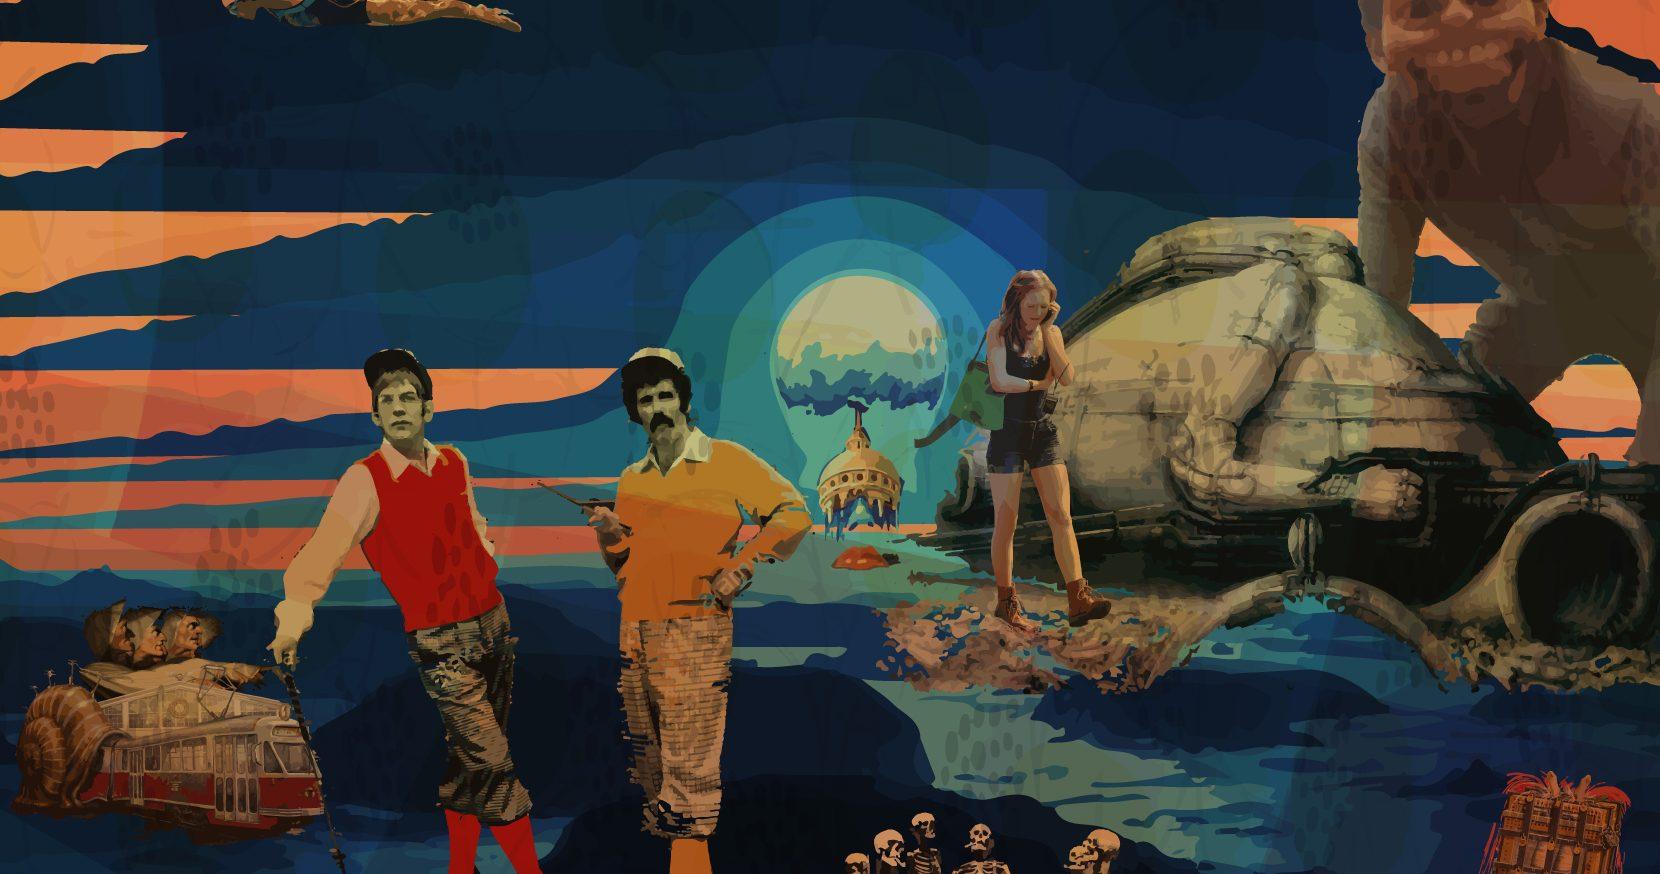 May Dune - The Krill artwork by Douglas Cameron (aka Rex Needles)